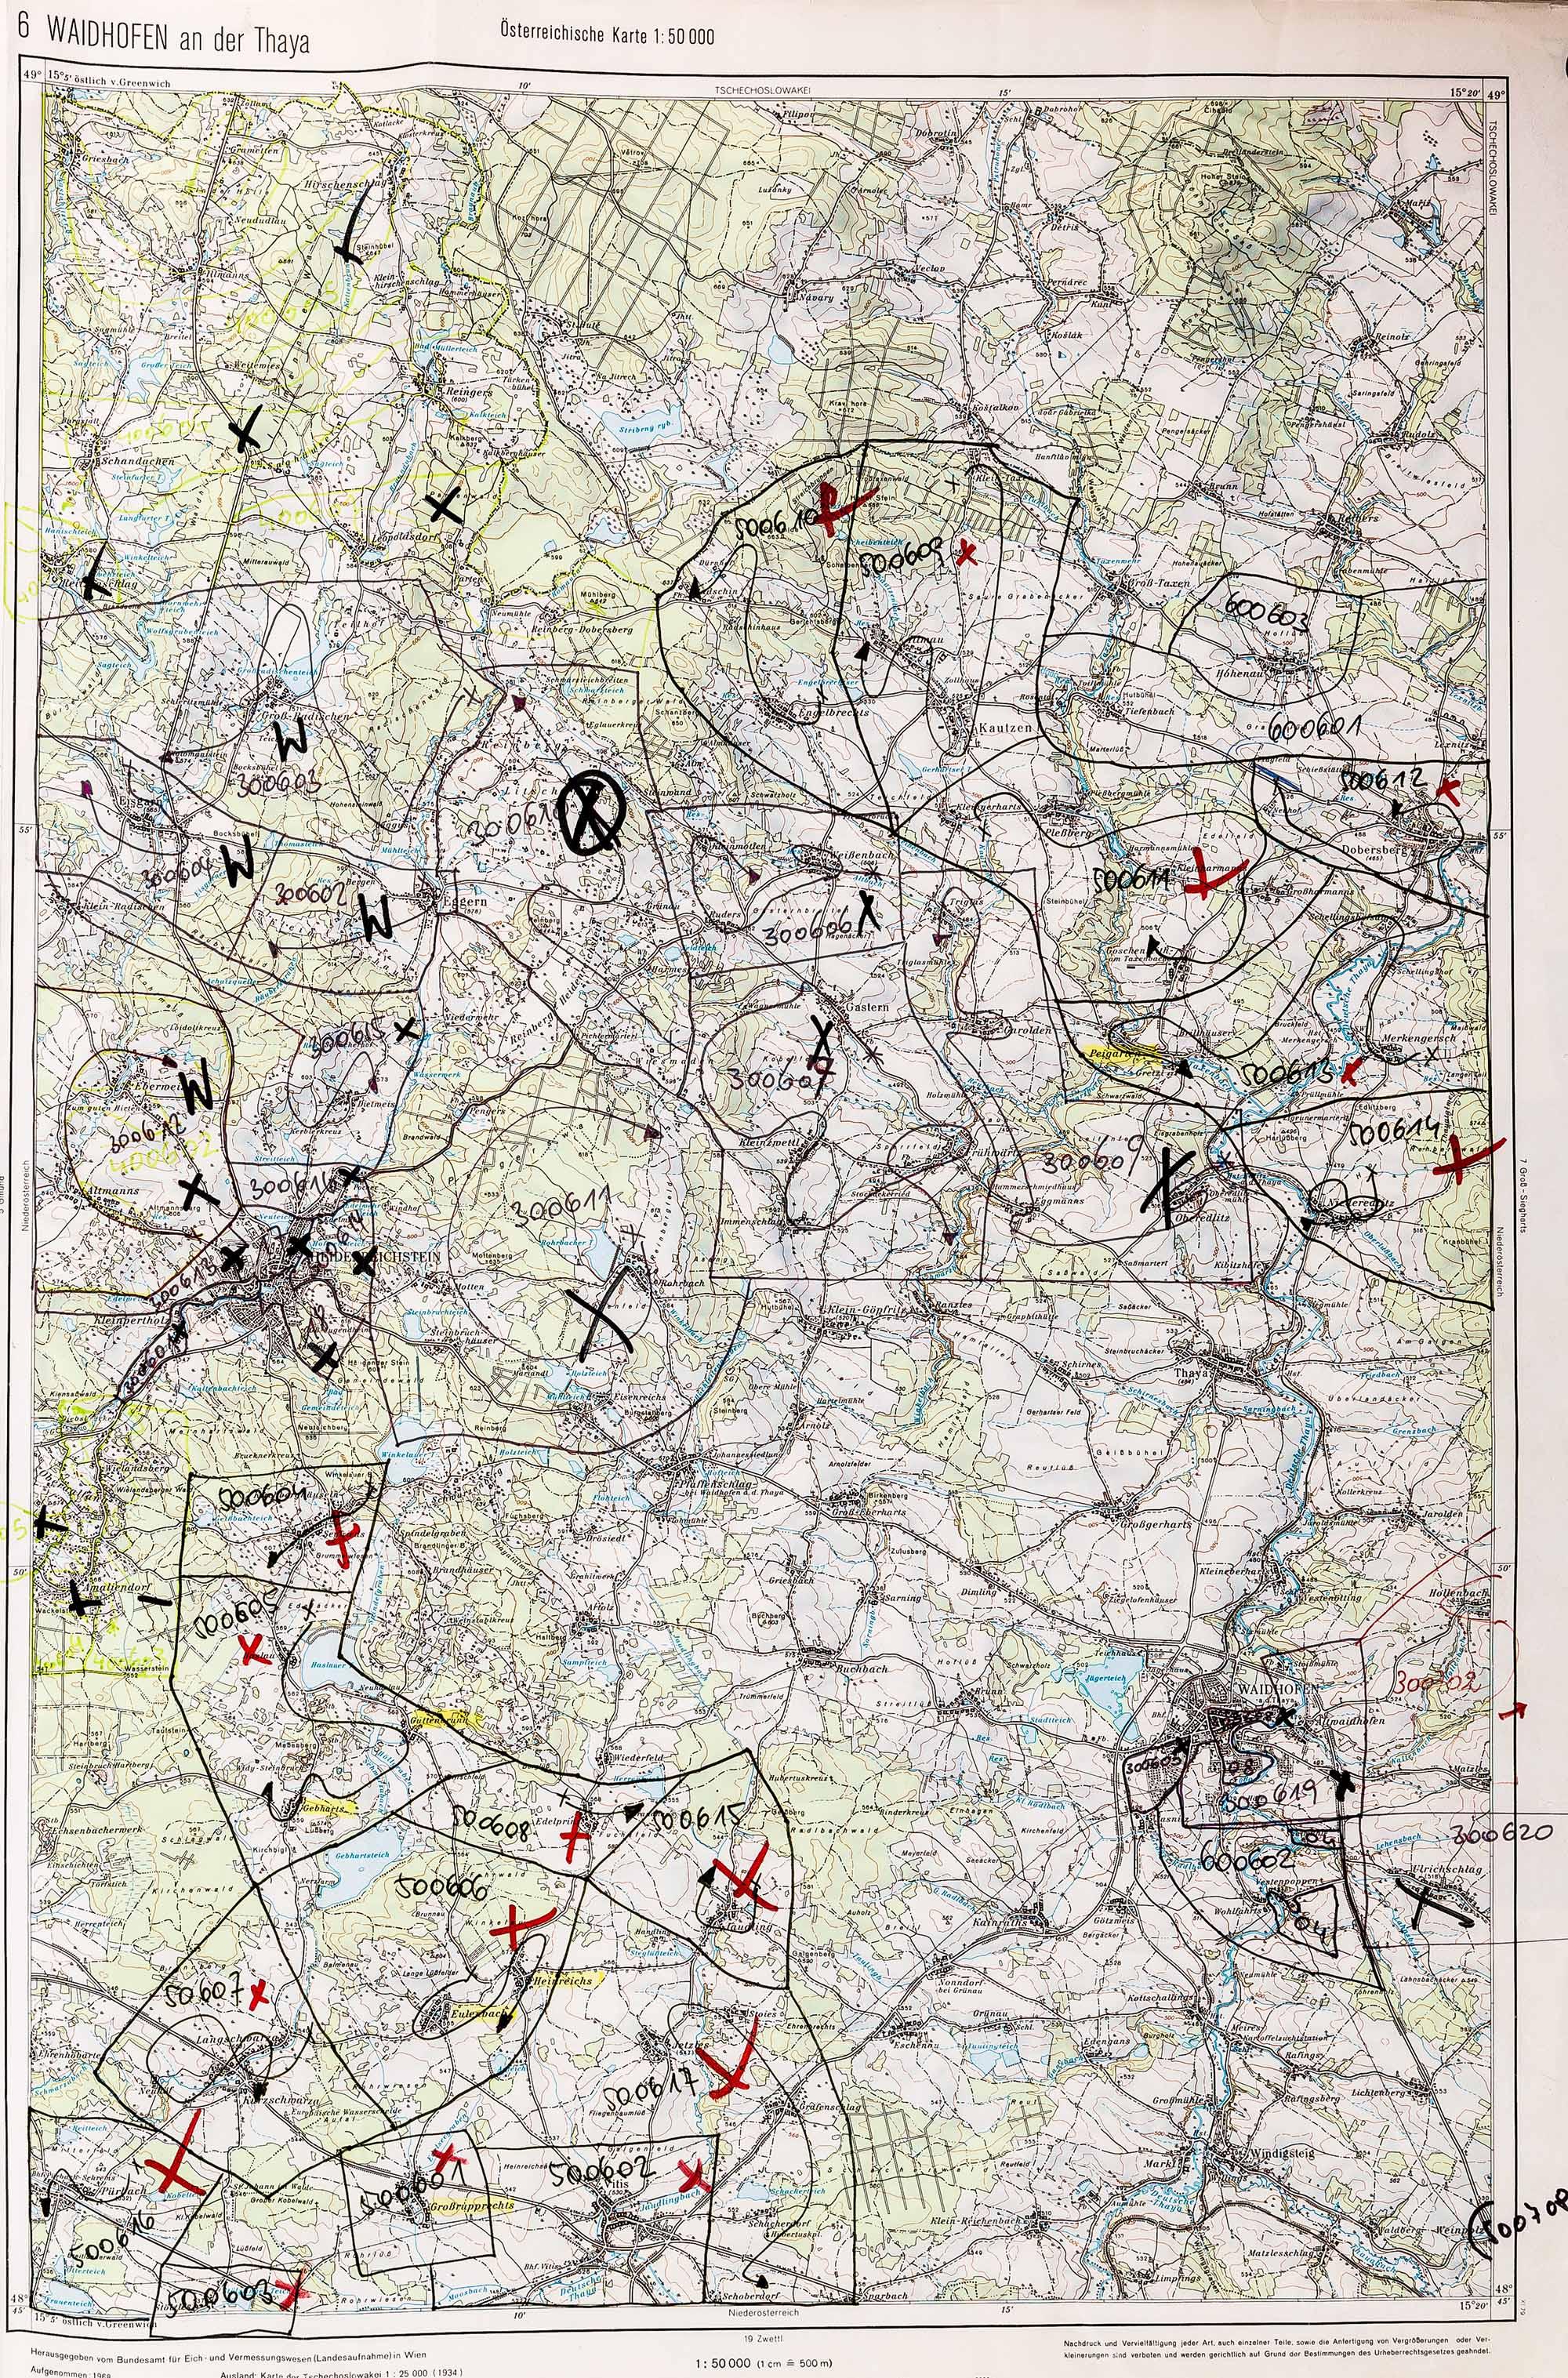 1983-1986 Karte 006